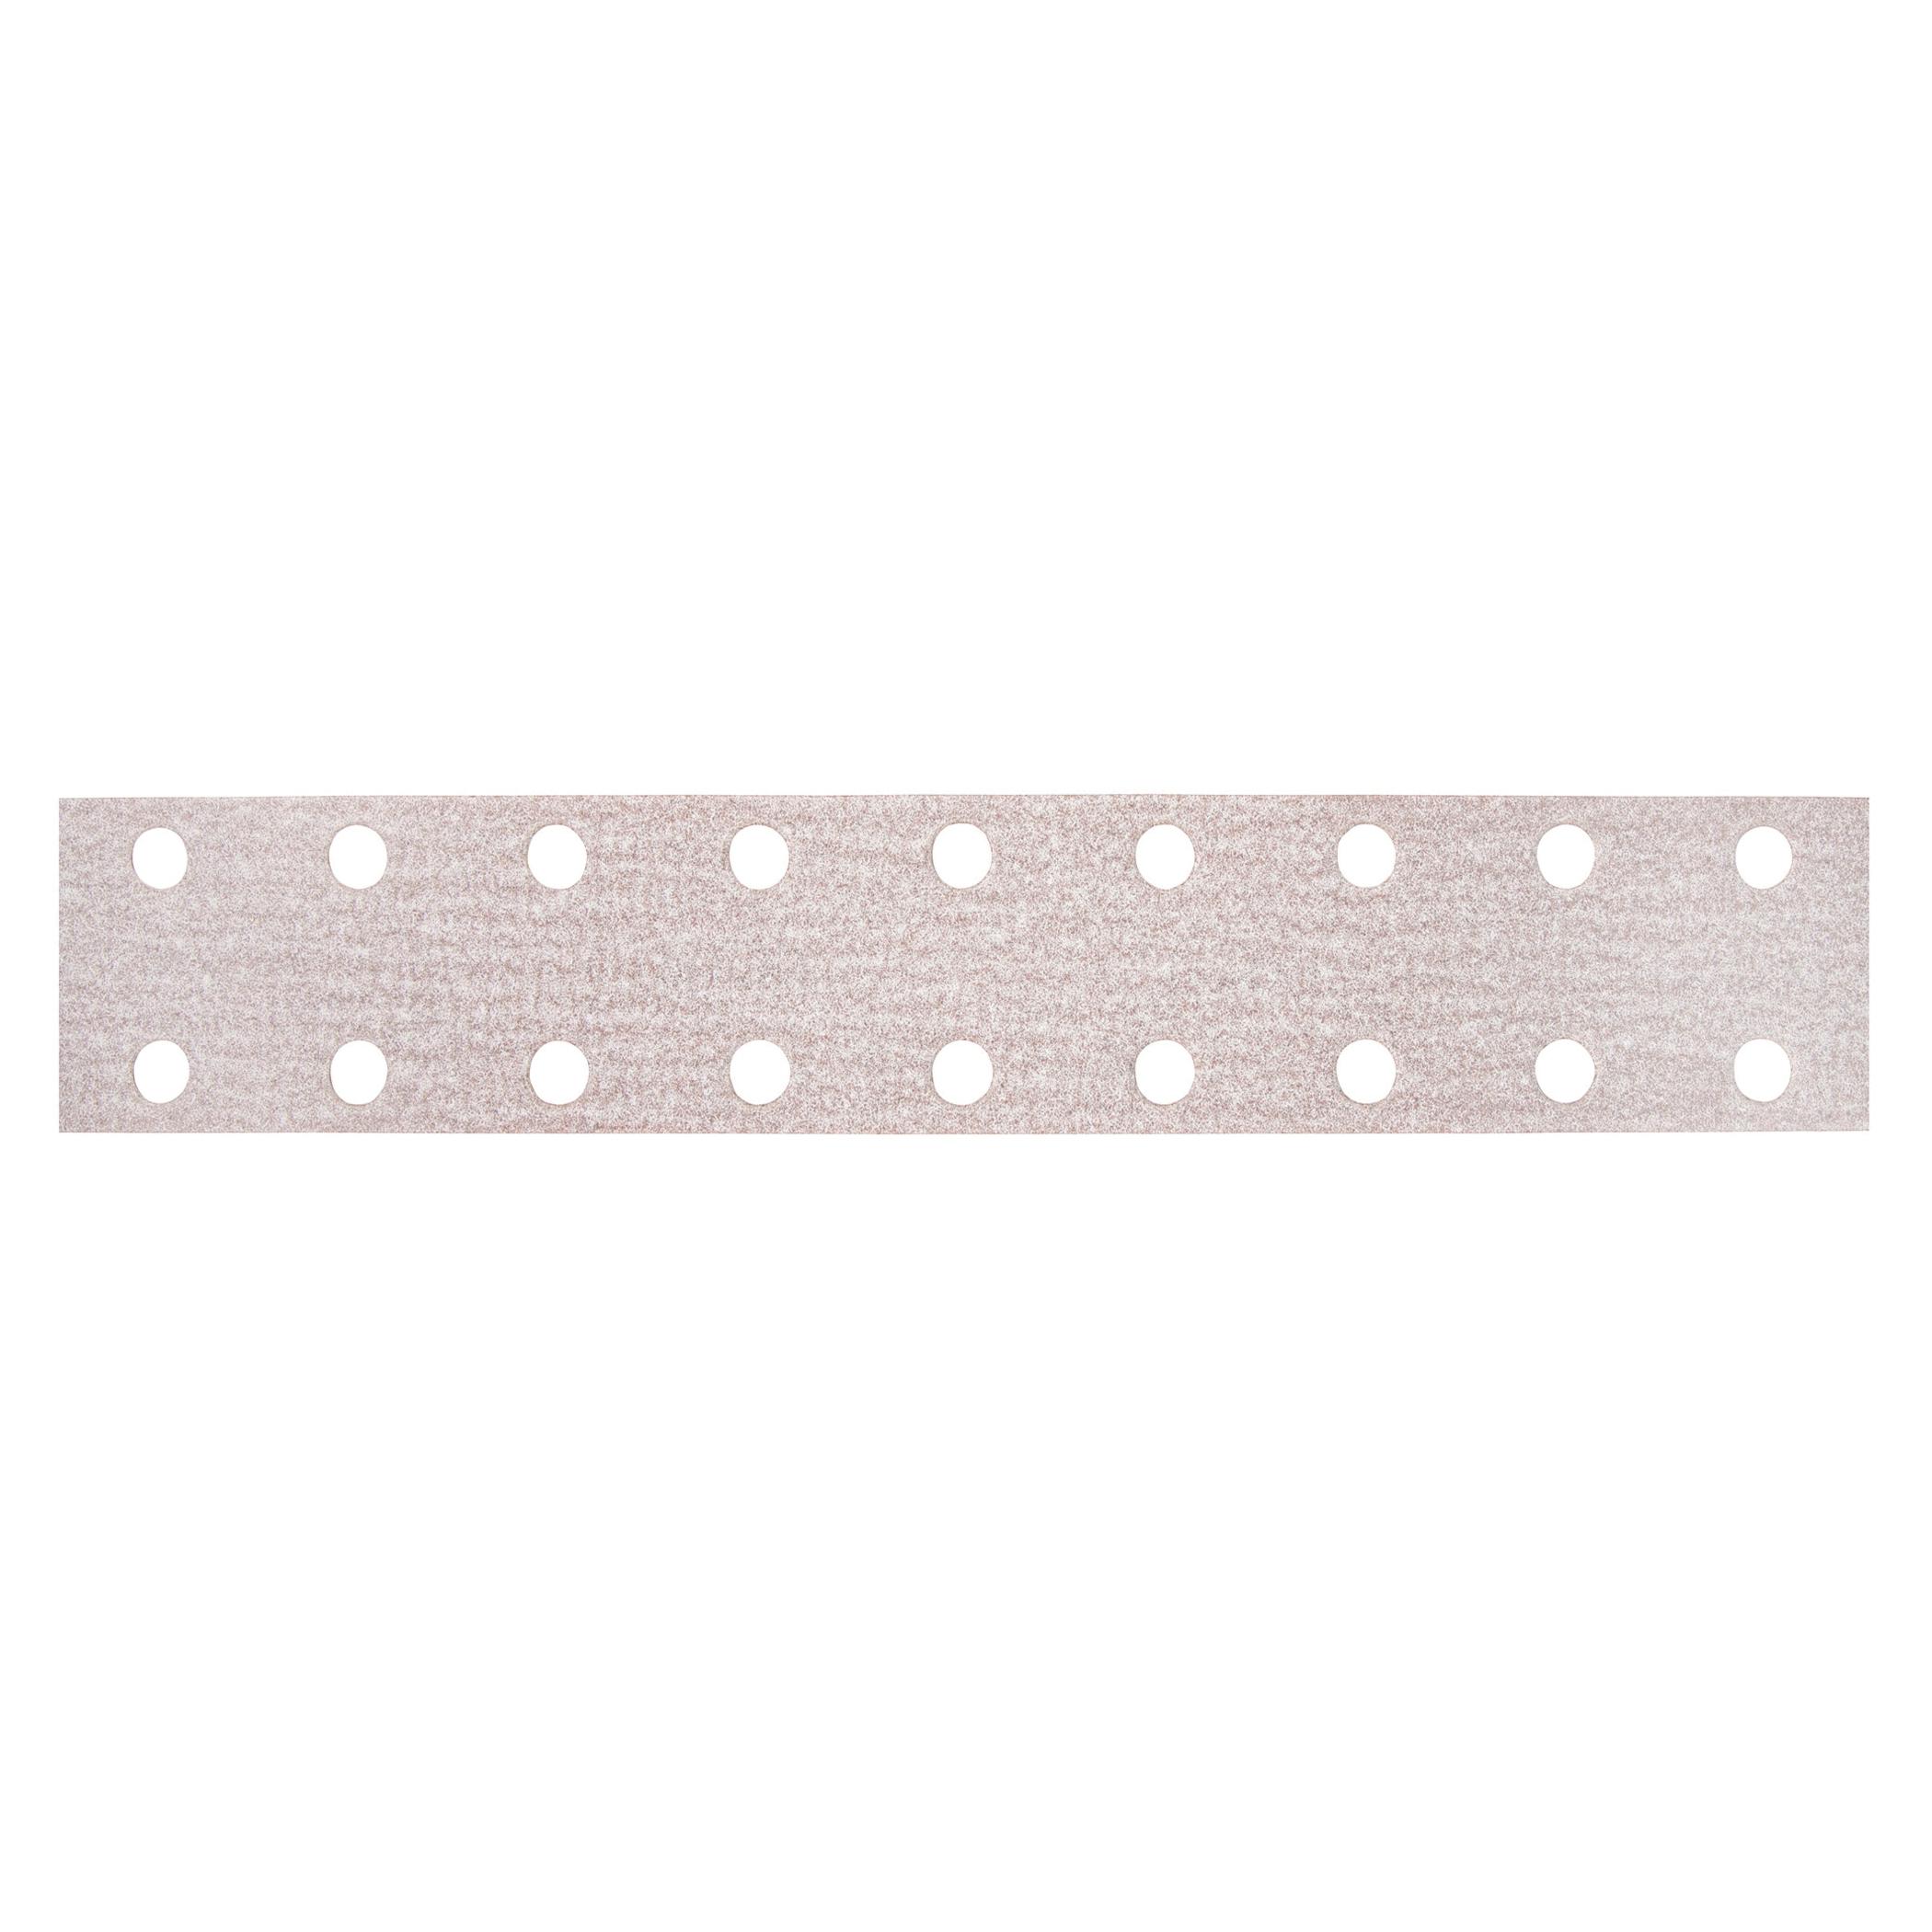 Norton® 66261131657 A275OP Vacuum Coated File Strip, 16 in L x 2-3/4 in W, P100 Grit, Medium Grade, Aluminum Oxide Abrasive, Anti-Loading Paper Backing